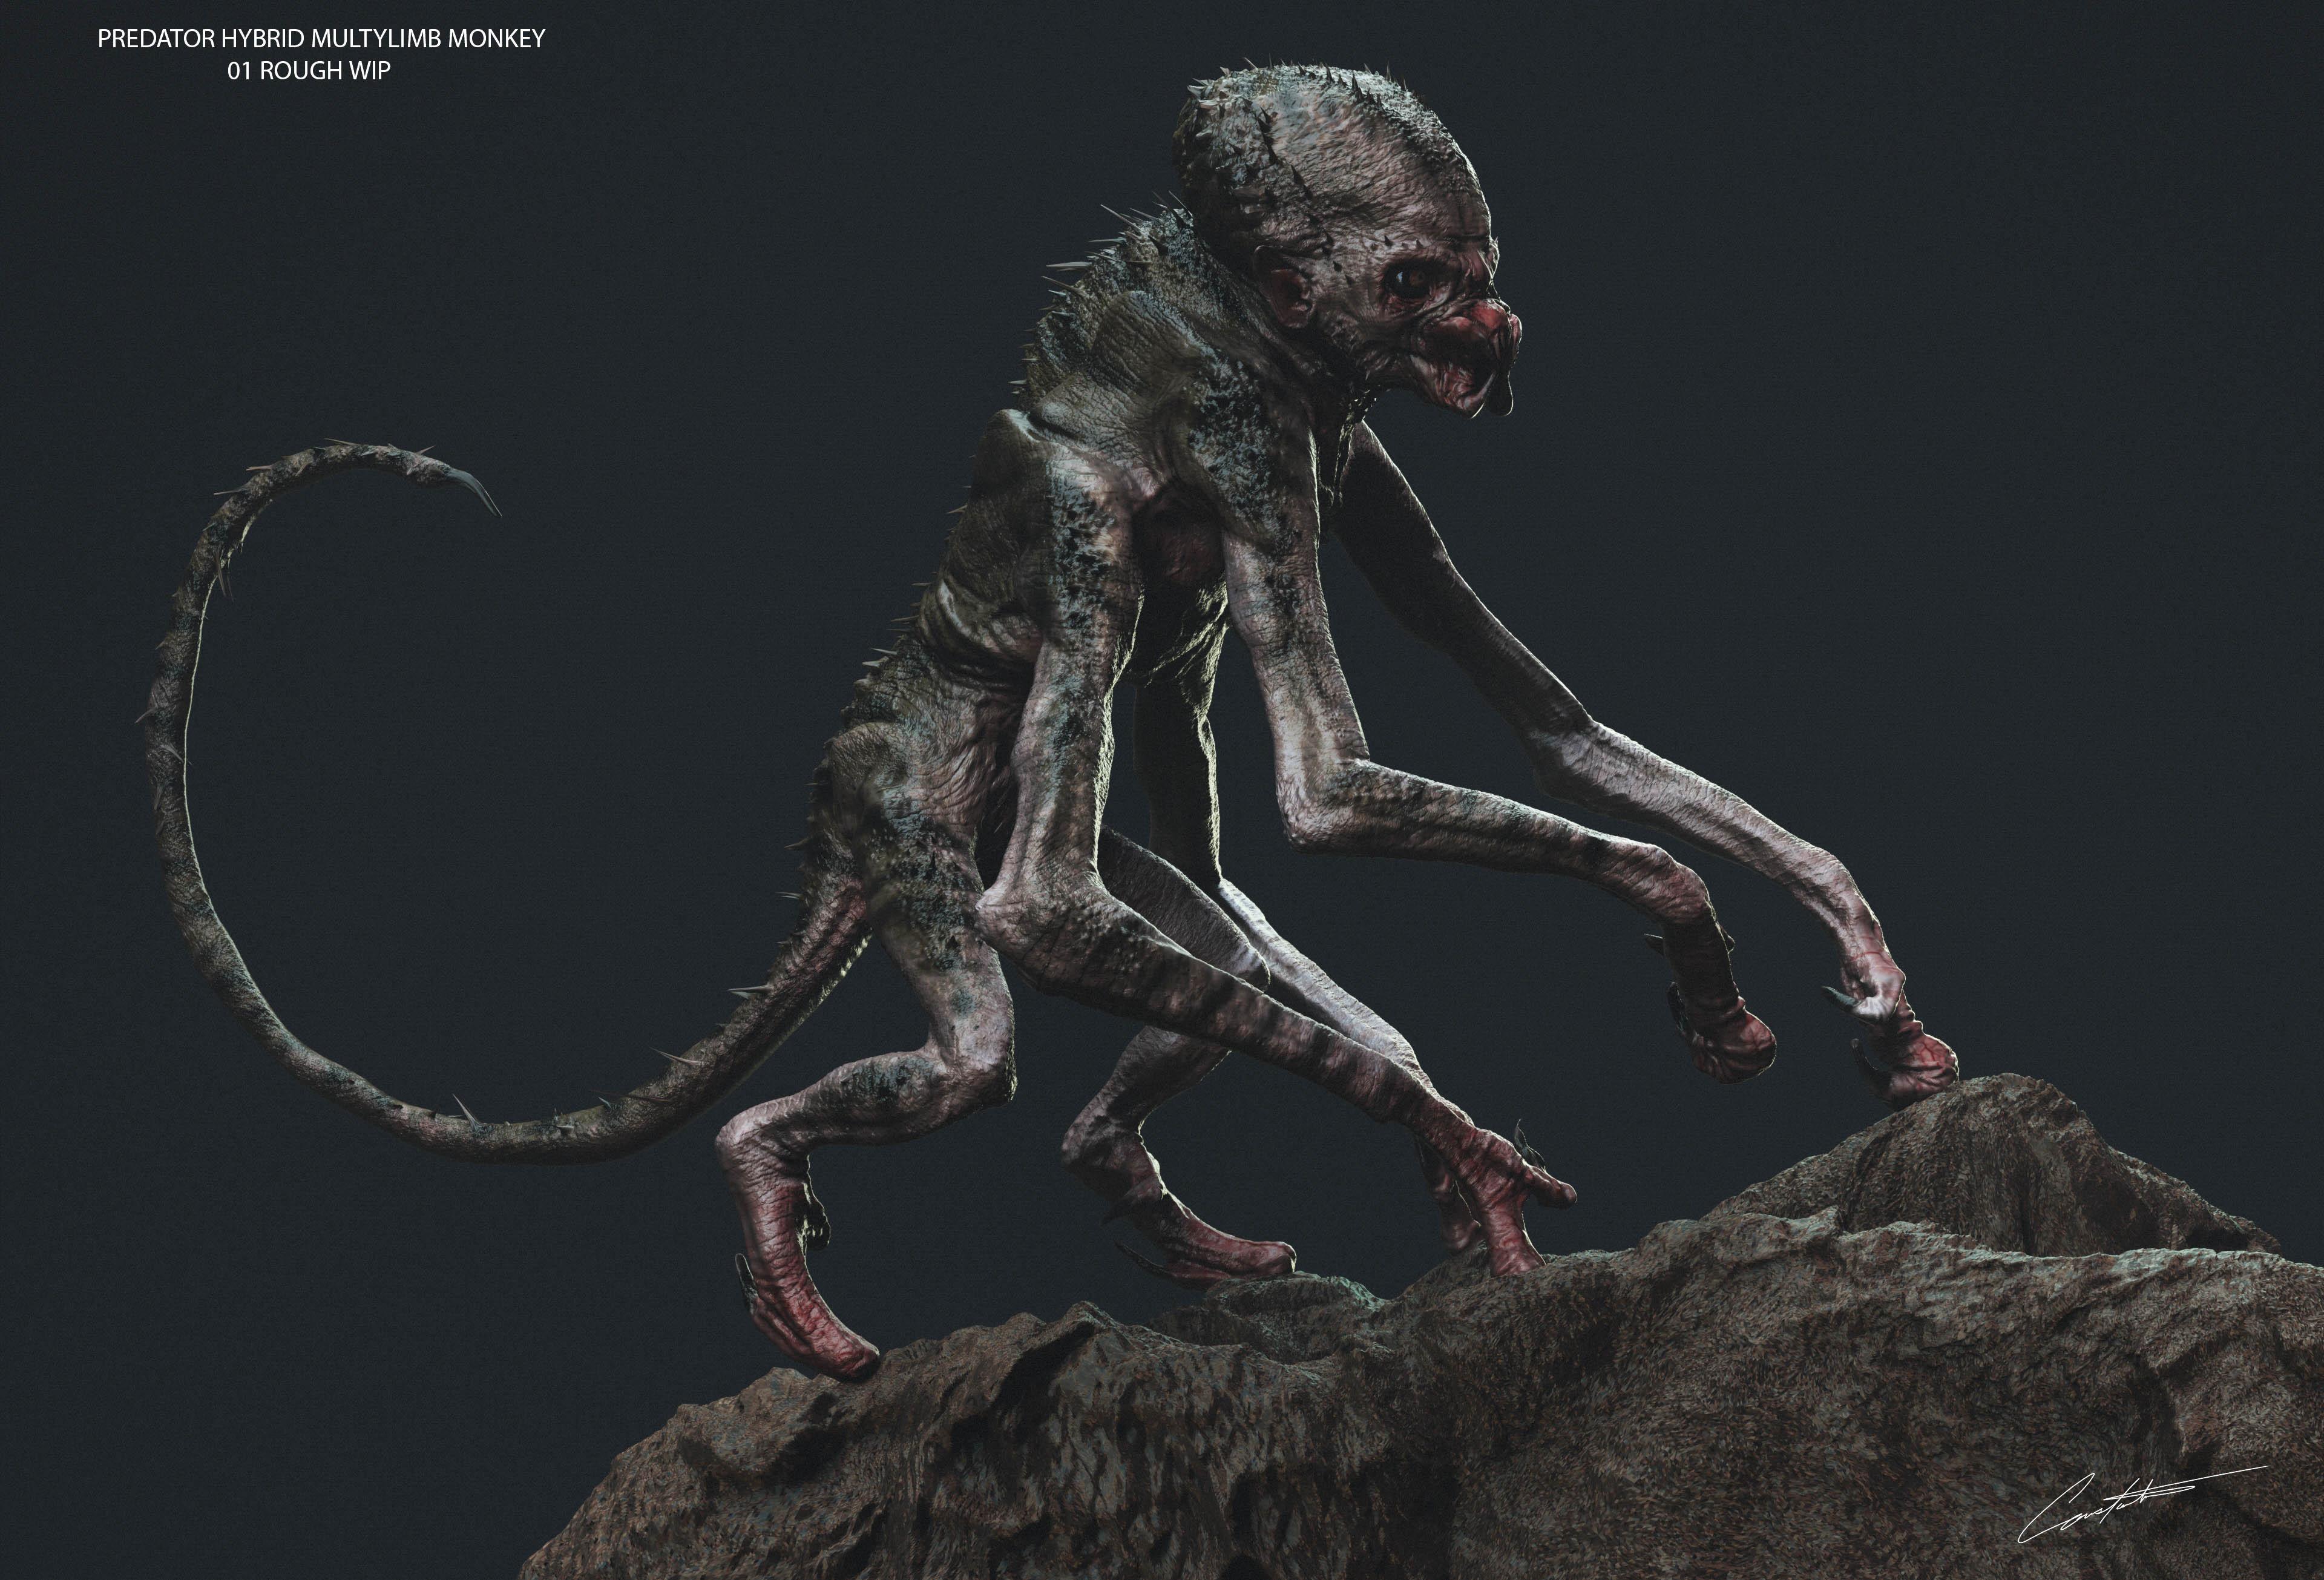 predator hybrid monkey creature design